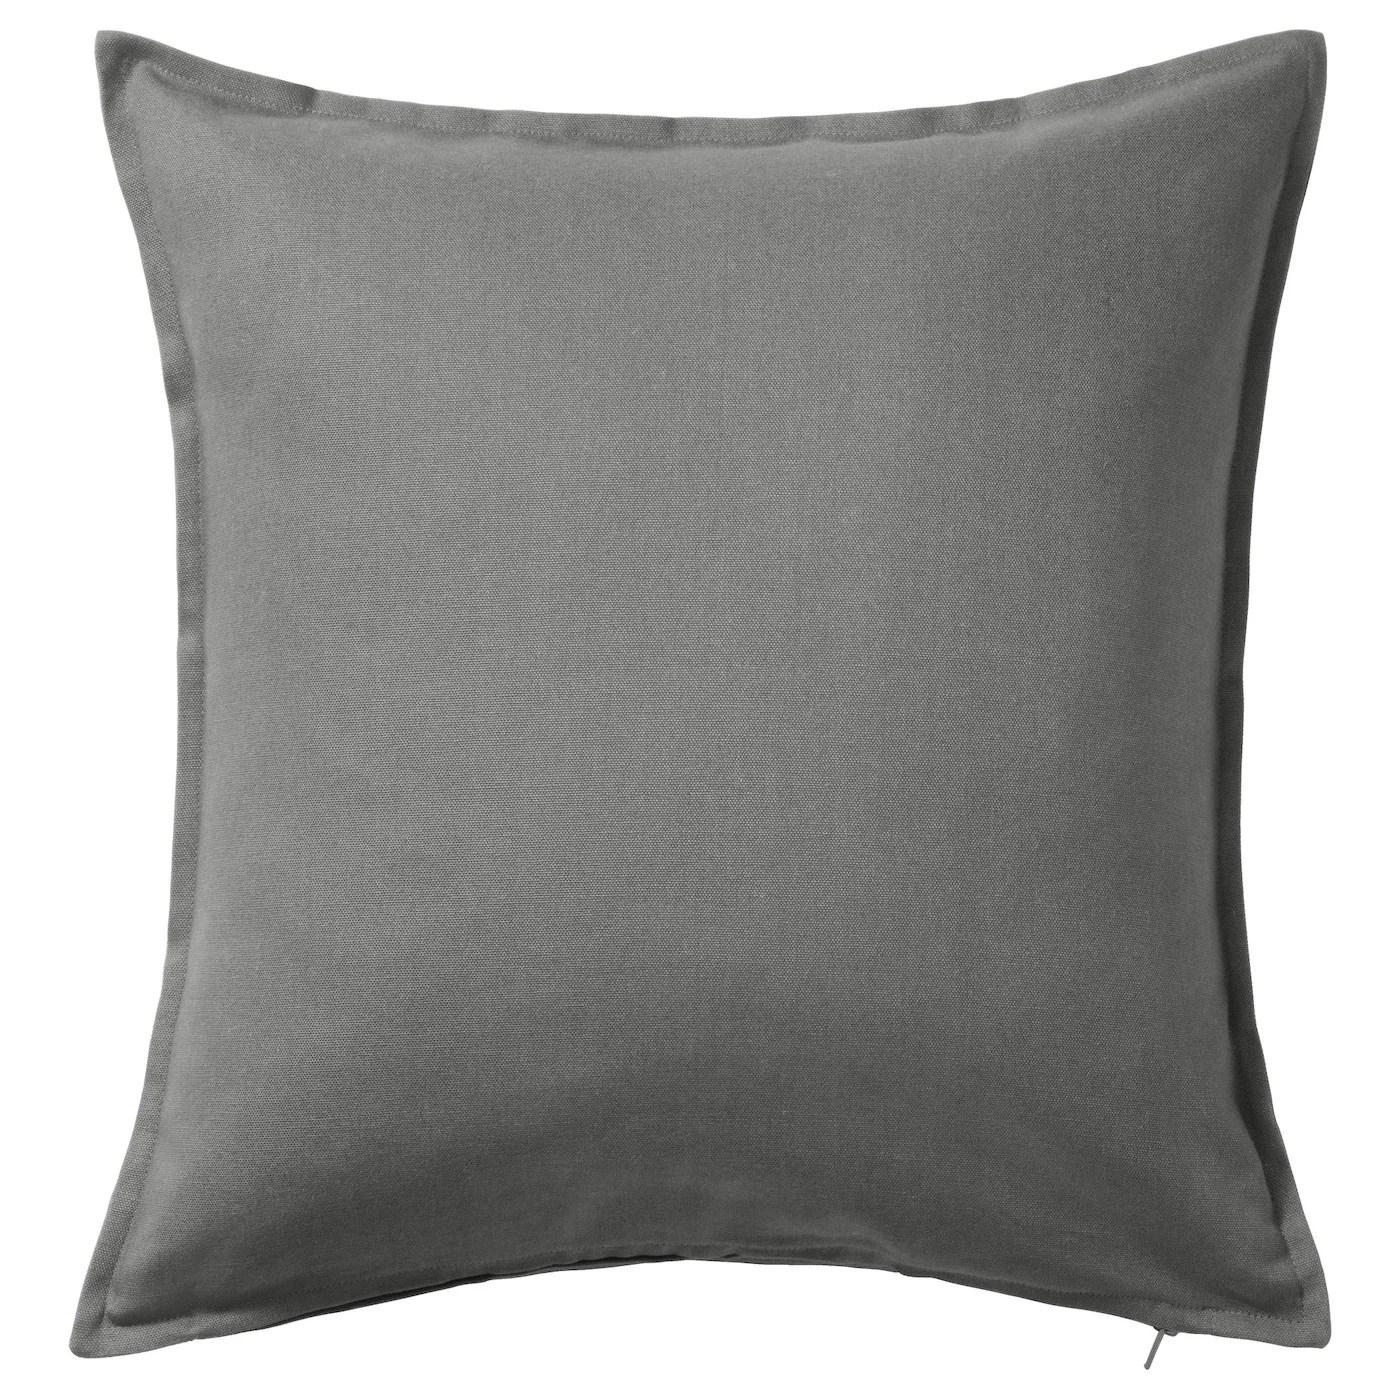 gurli cushion cover gray 26x26